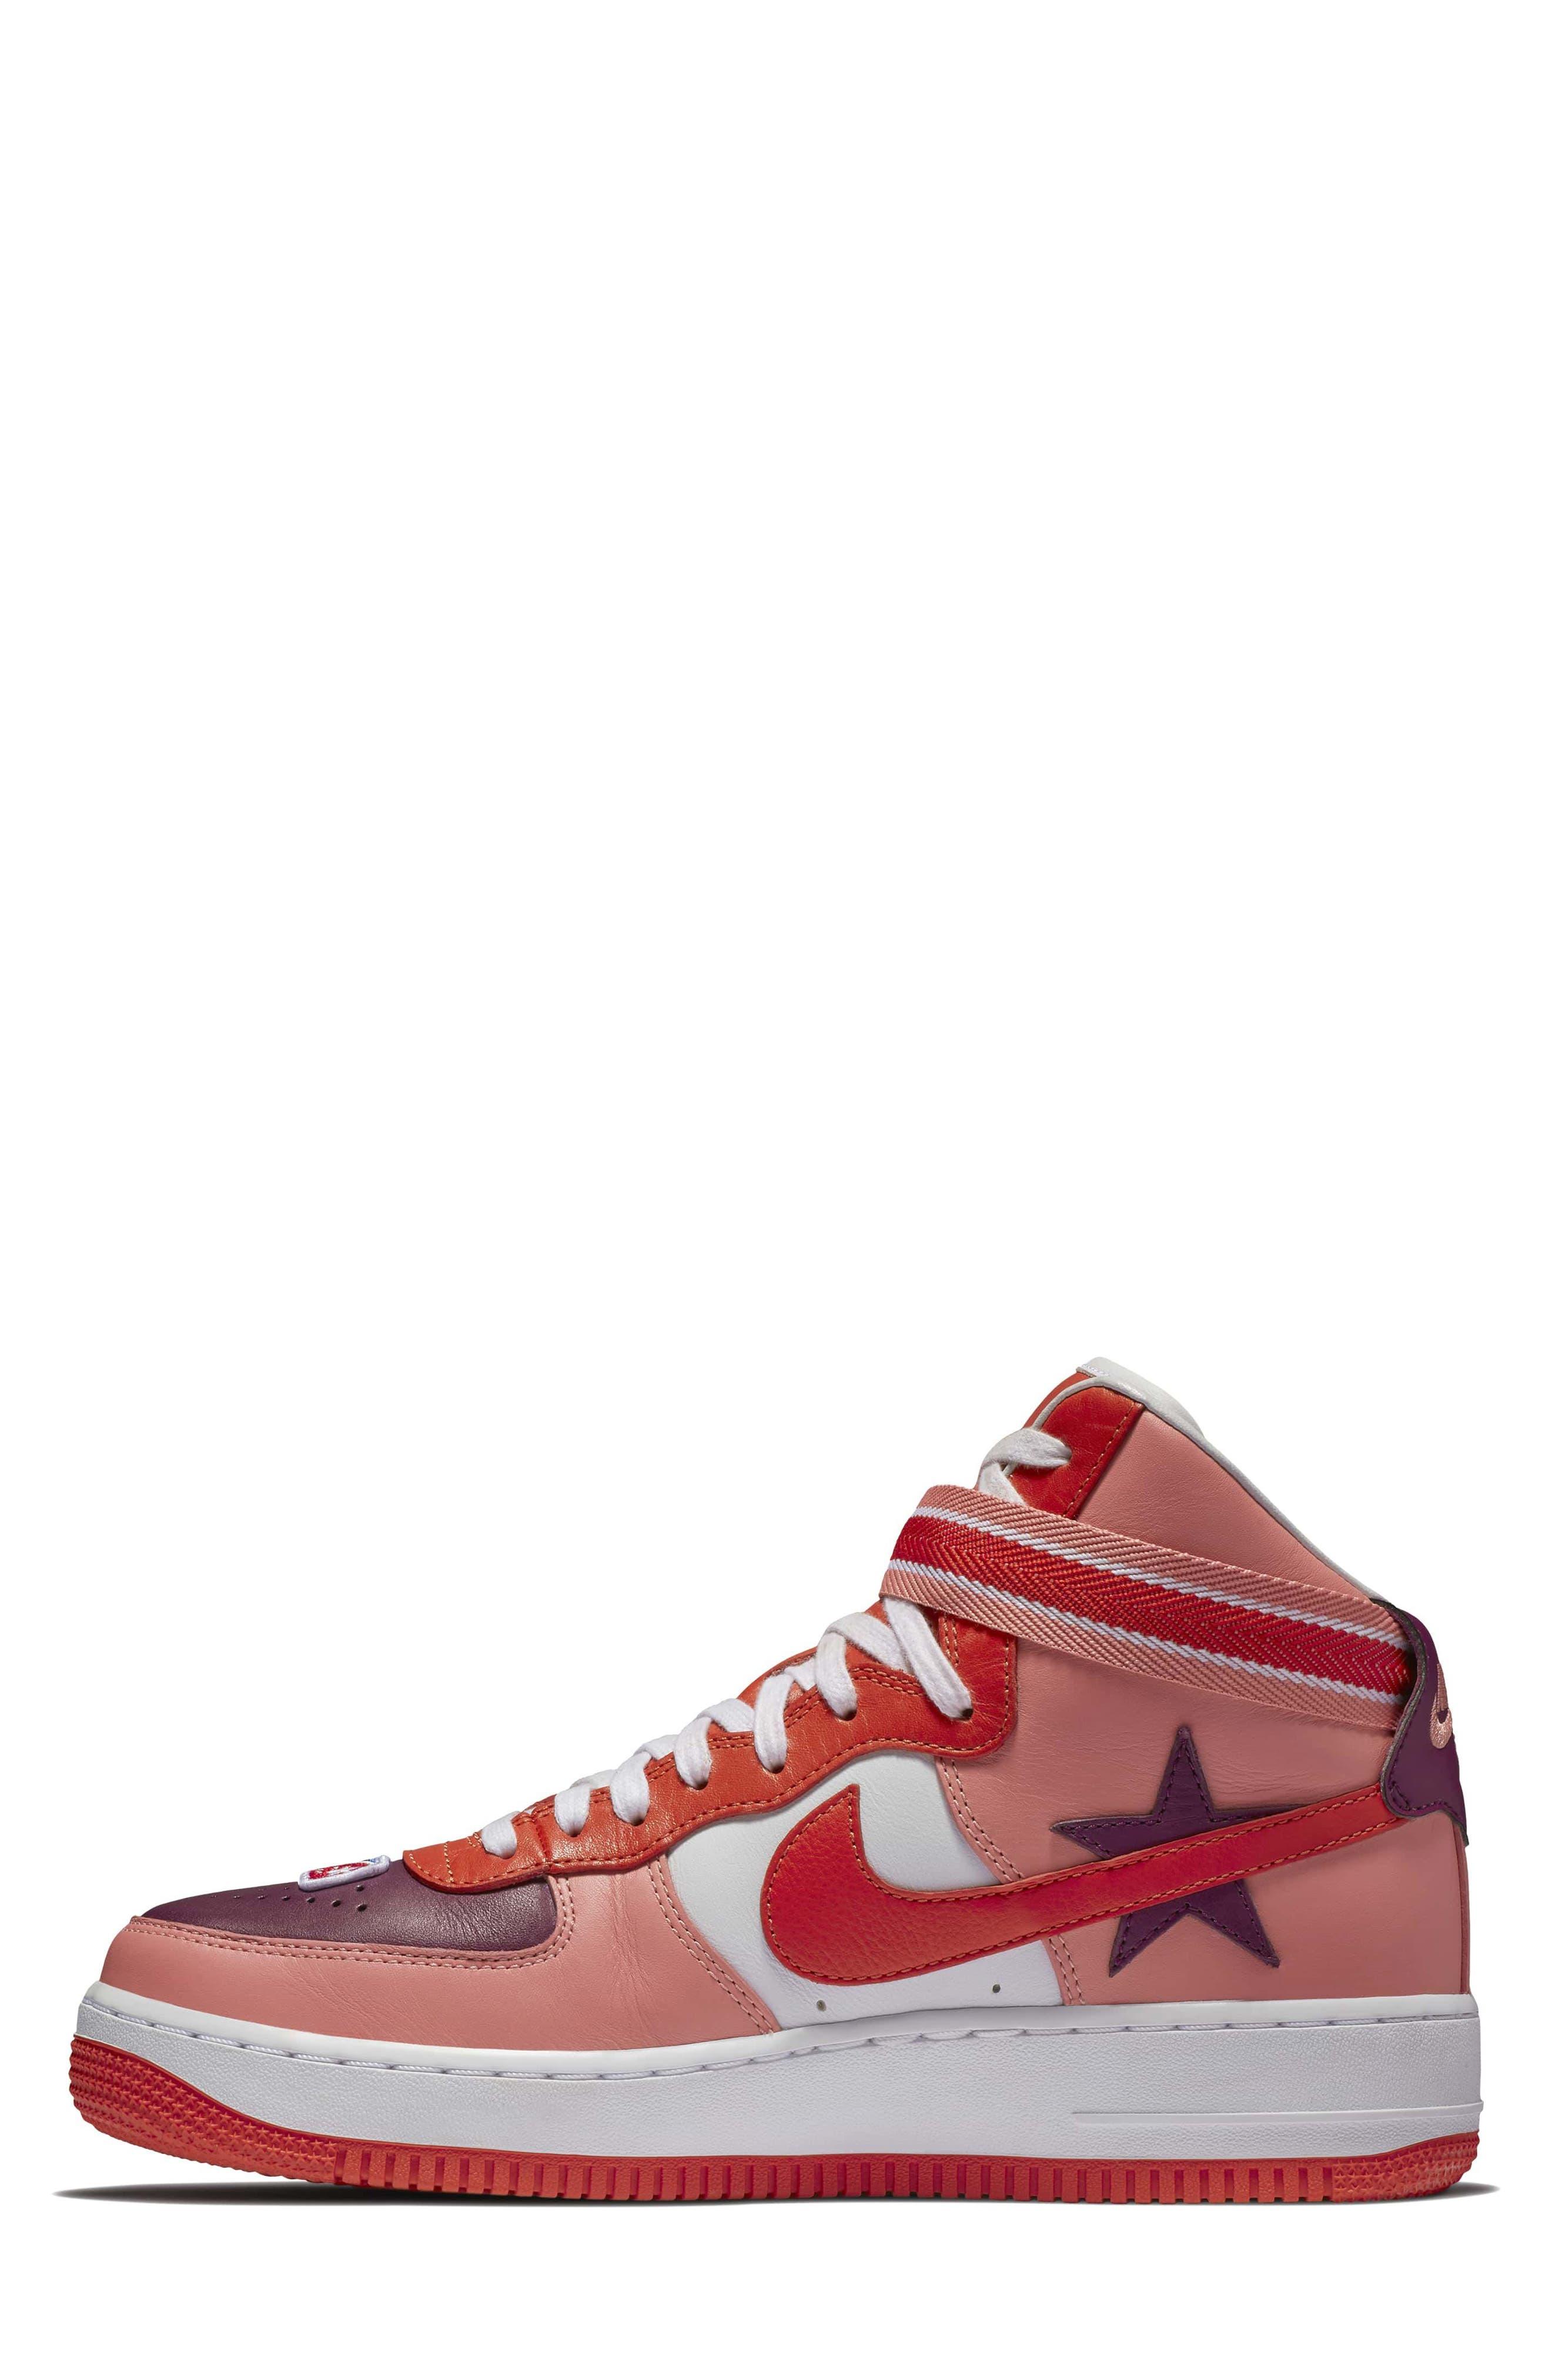 Air Force 1 High RT Sneaker,                             Alternate thumbnail 3, color,                             Coral/ Bordeax/ Orange/ Black